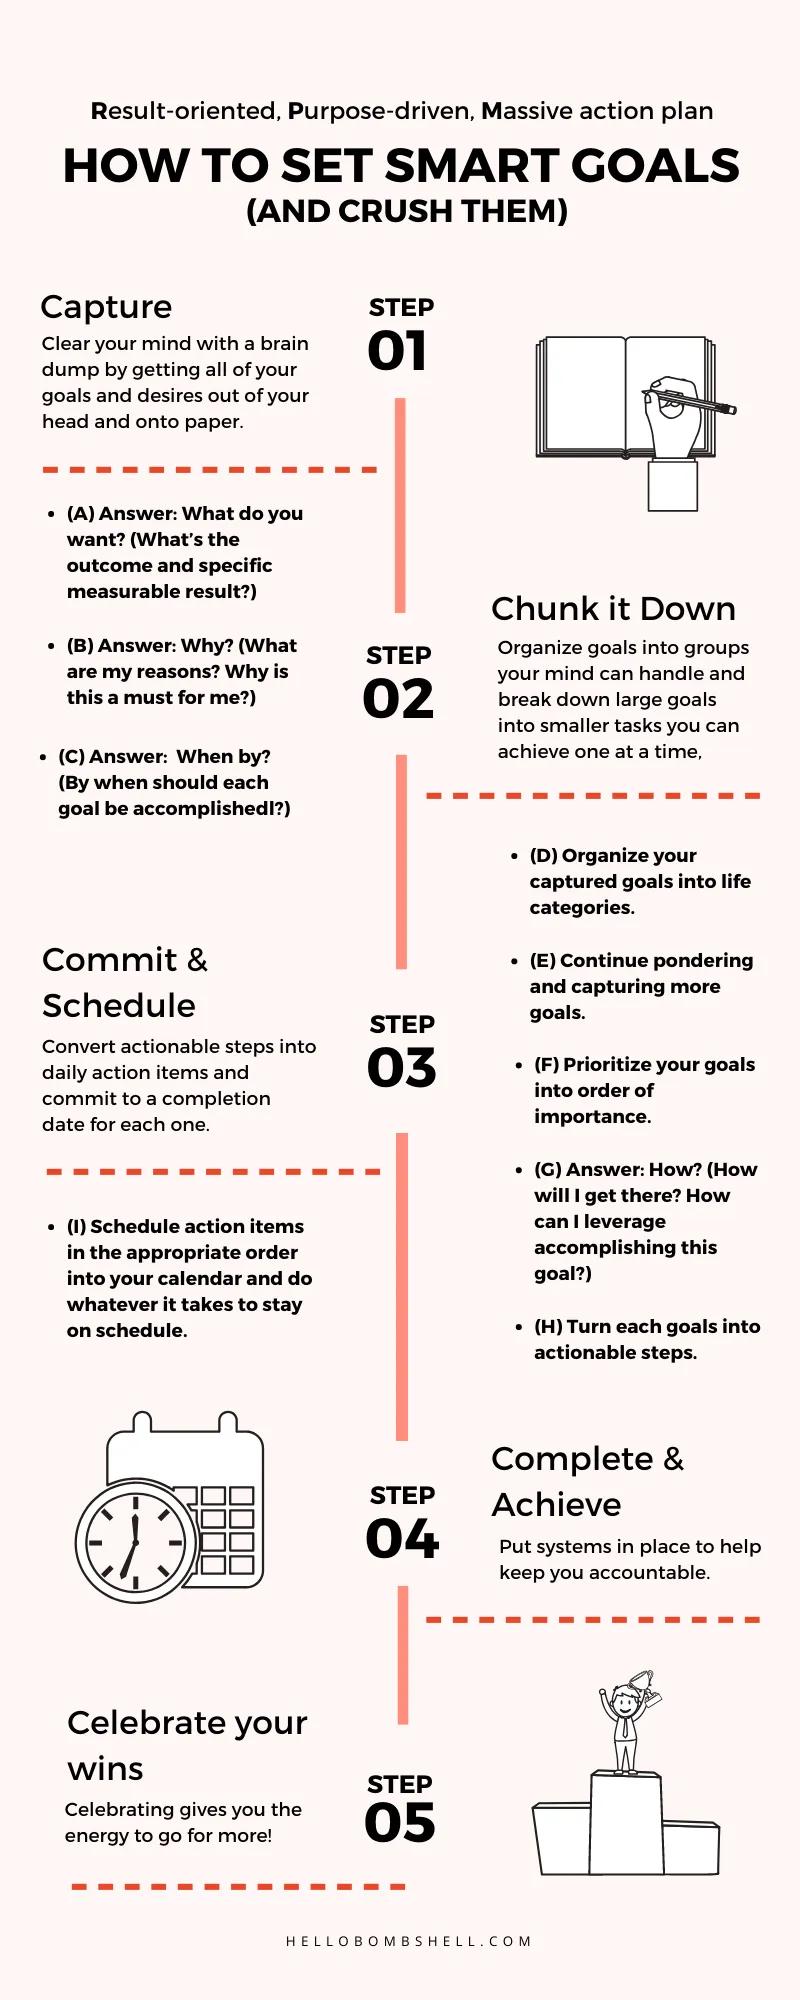 How To Set Smart Goals For 2020 Like Tony Robbins: 5 RPM Goal Setting Steps - Hello Bombshell!